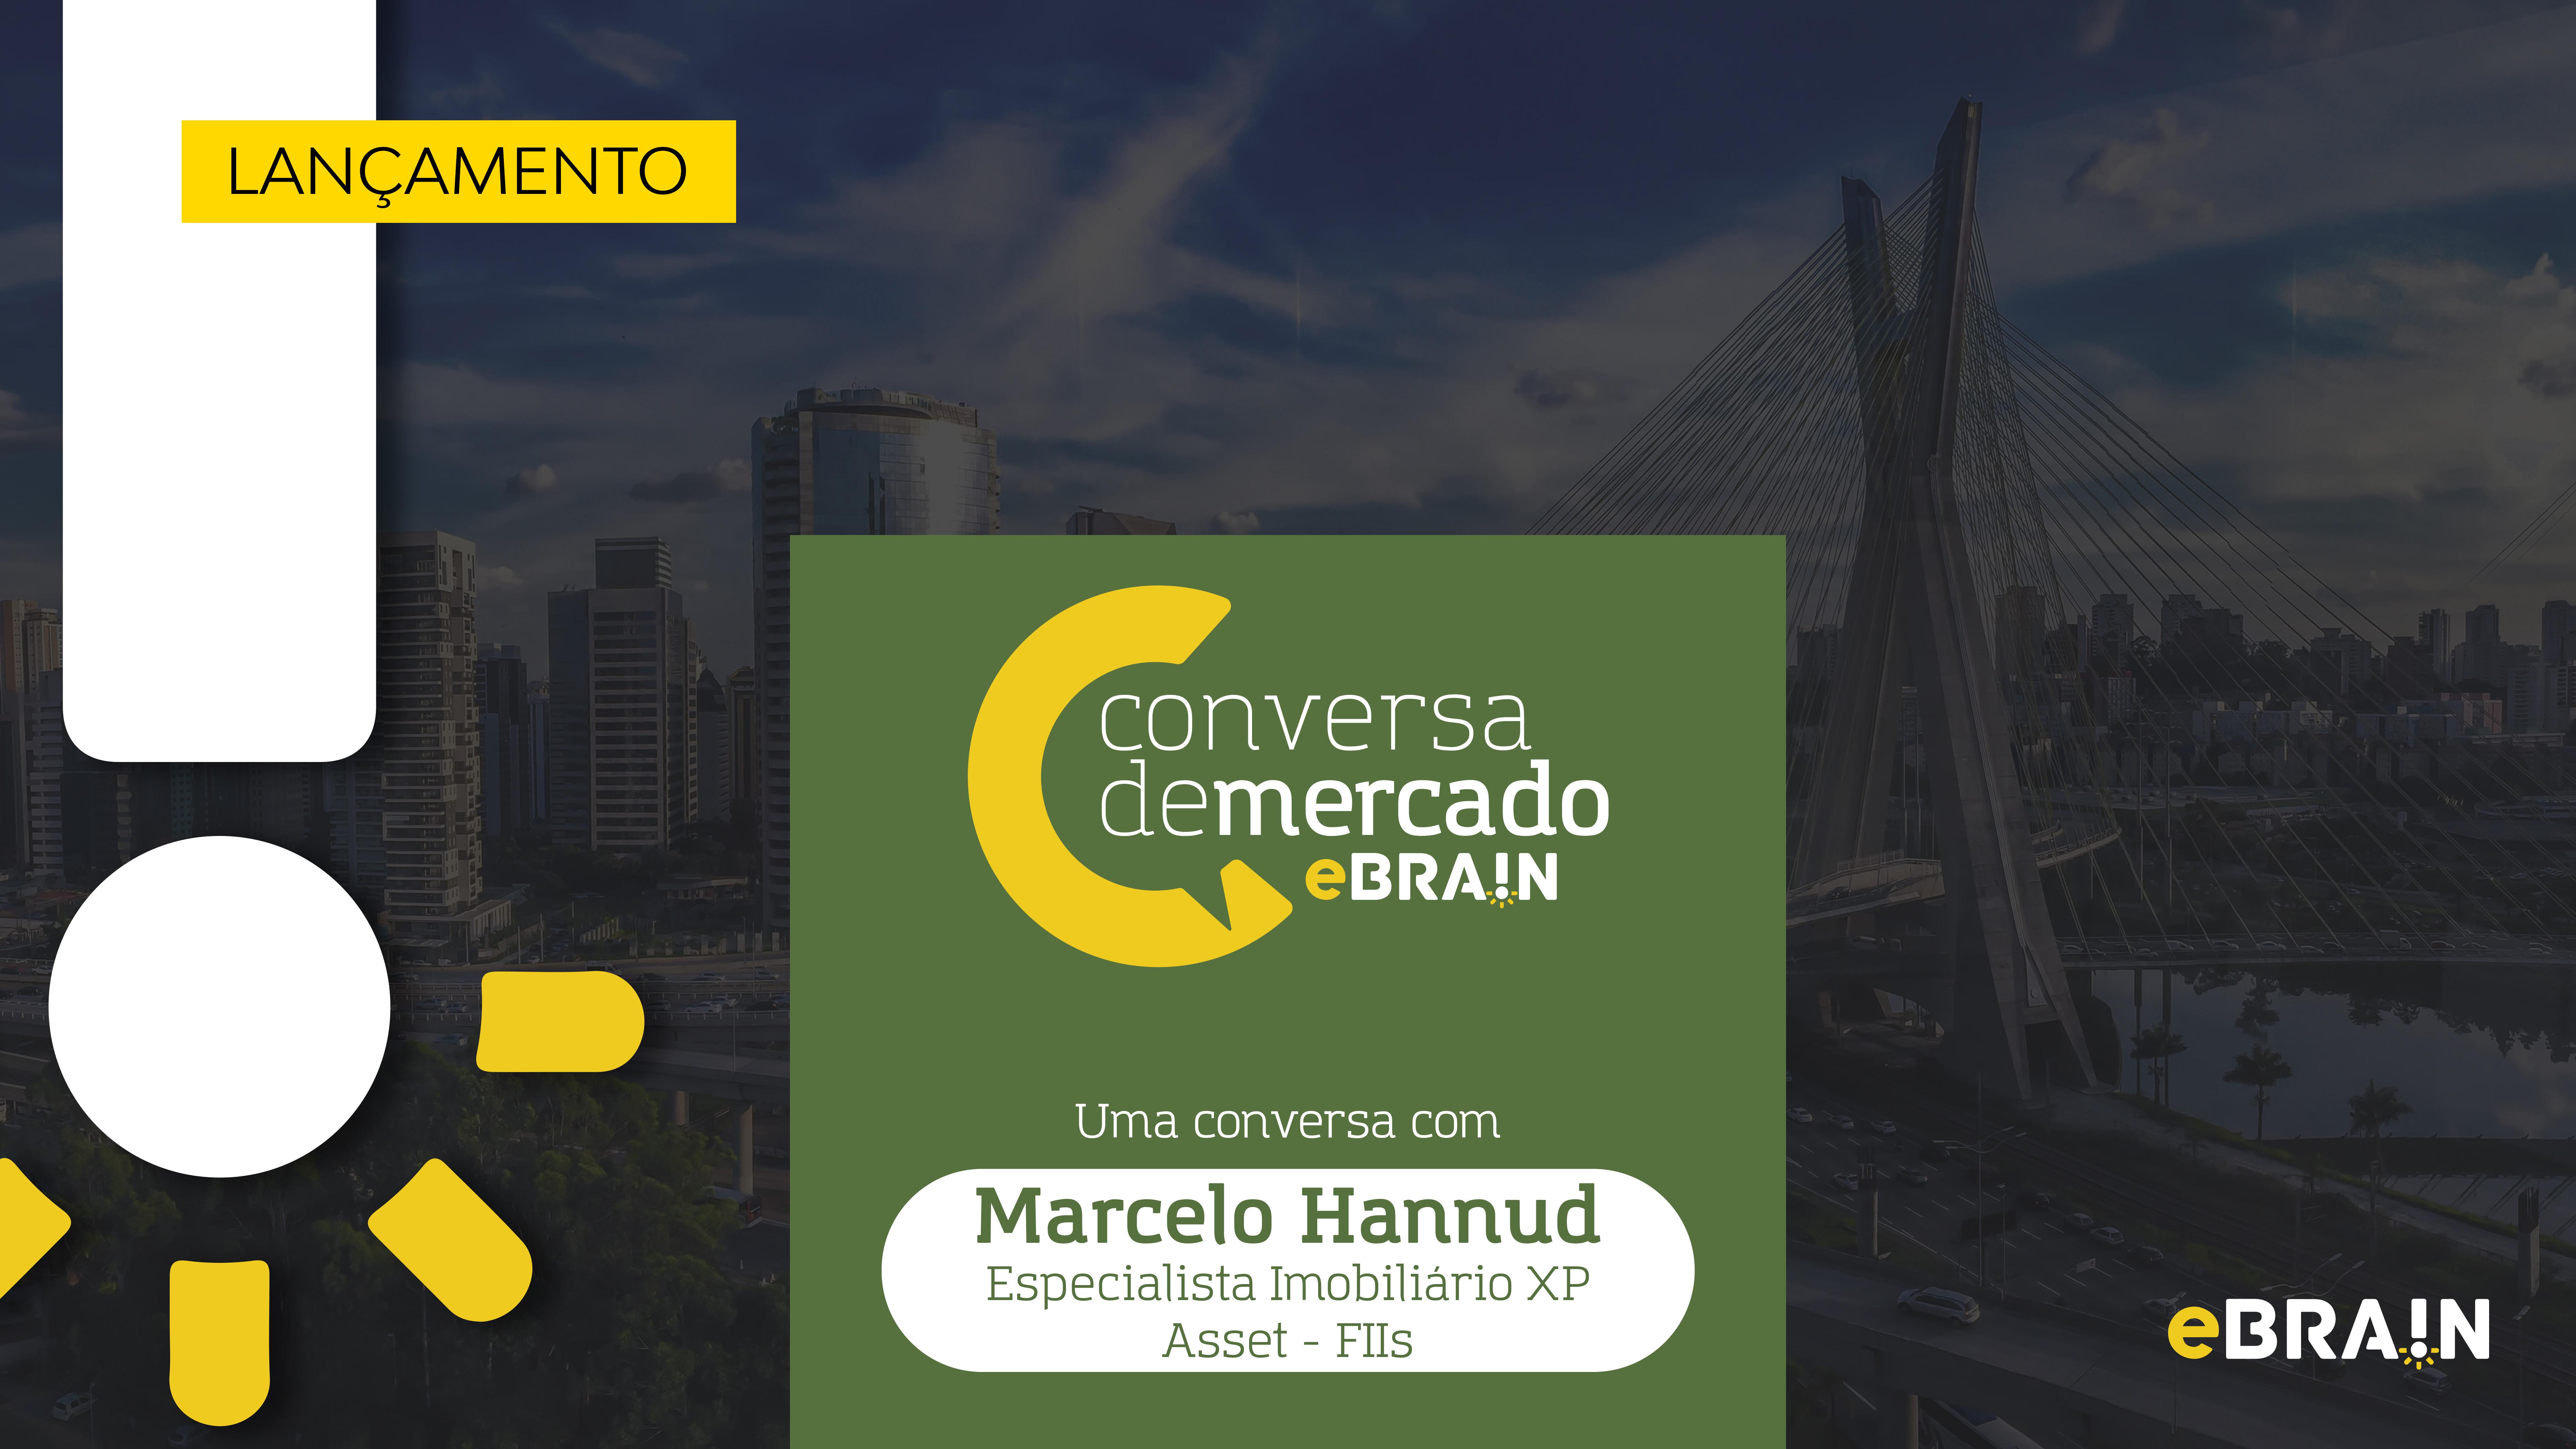 Marcelo%2bhannud lancamento